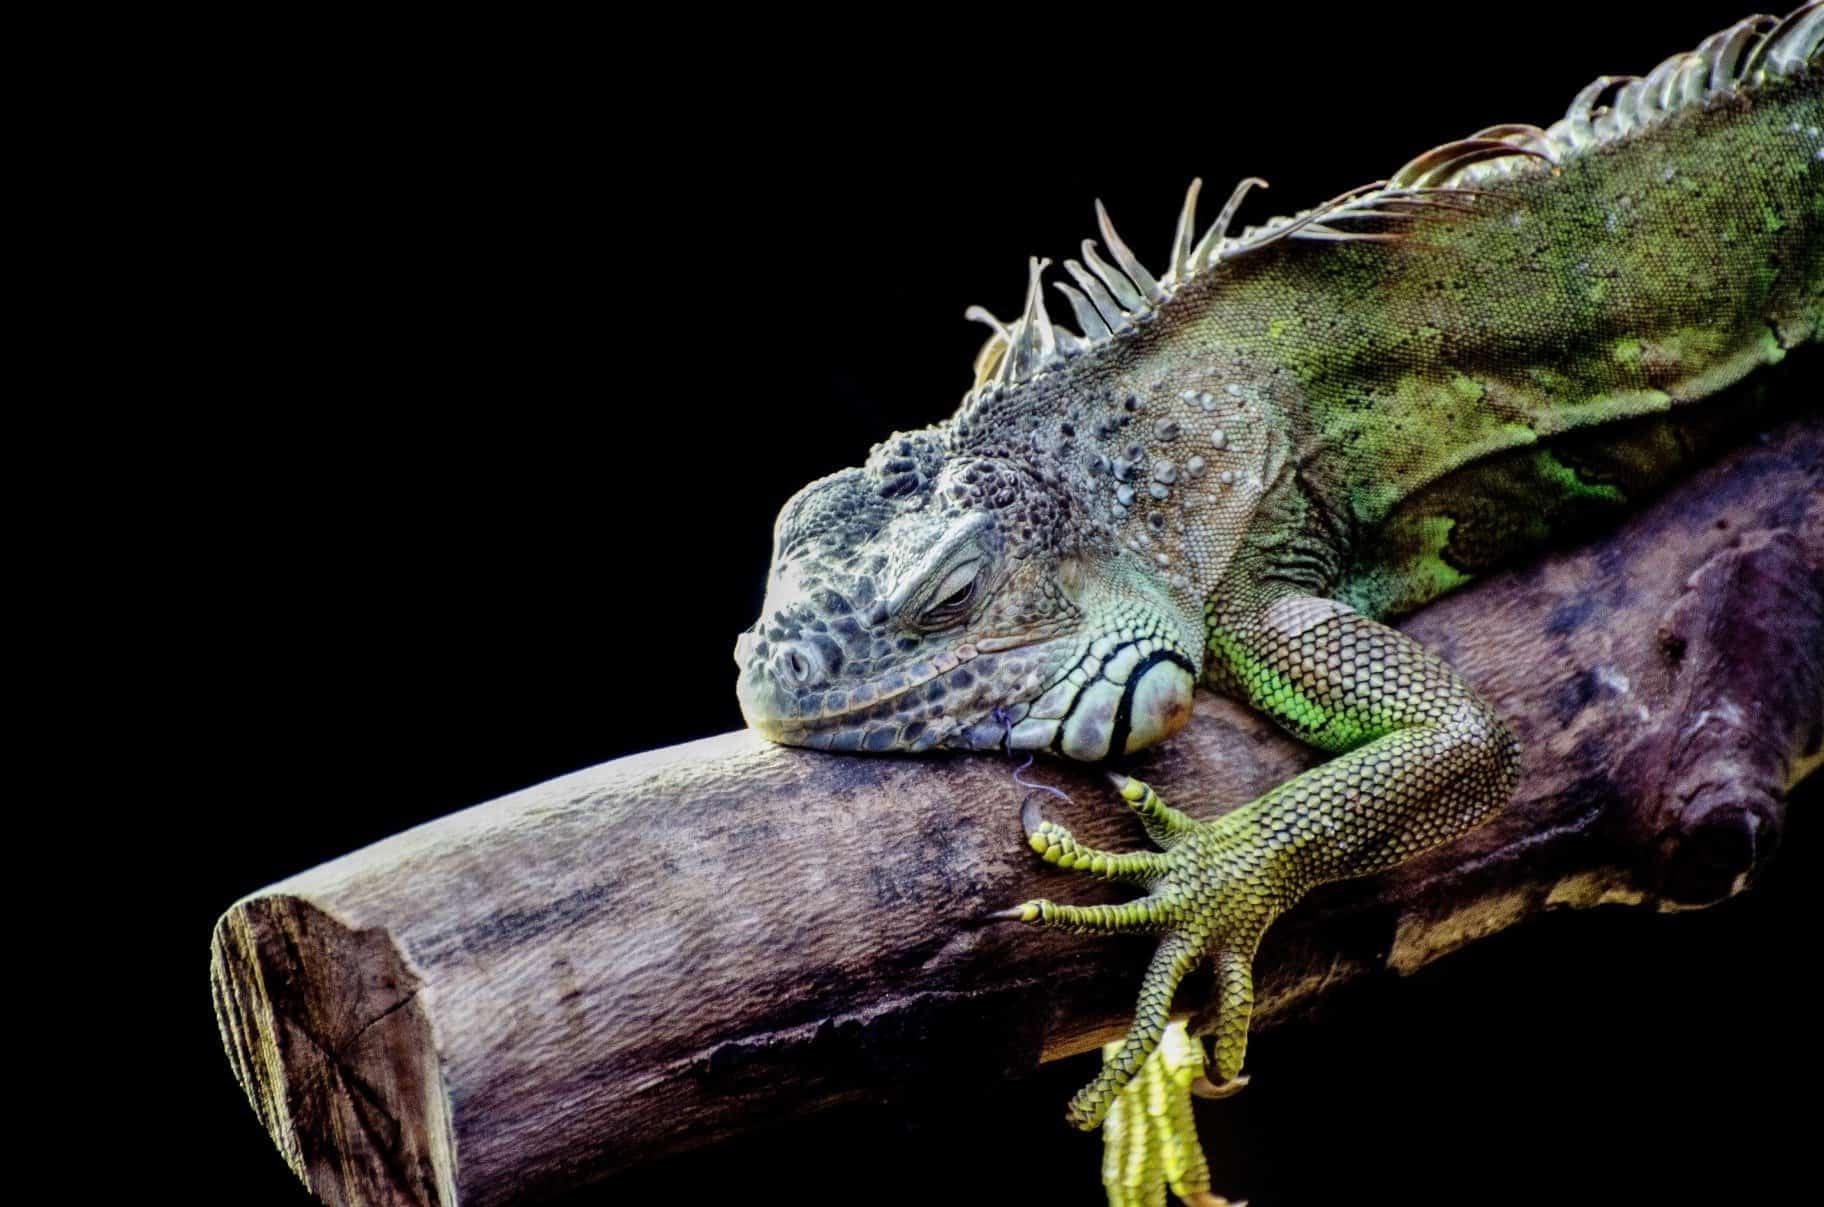 reptile camouflage lizard animal dragon iguana nature wildlife chameleon reptiles wood animals wild desert lizards tree geckos kb pixnio